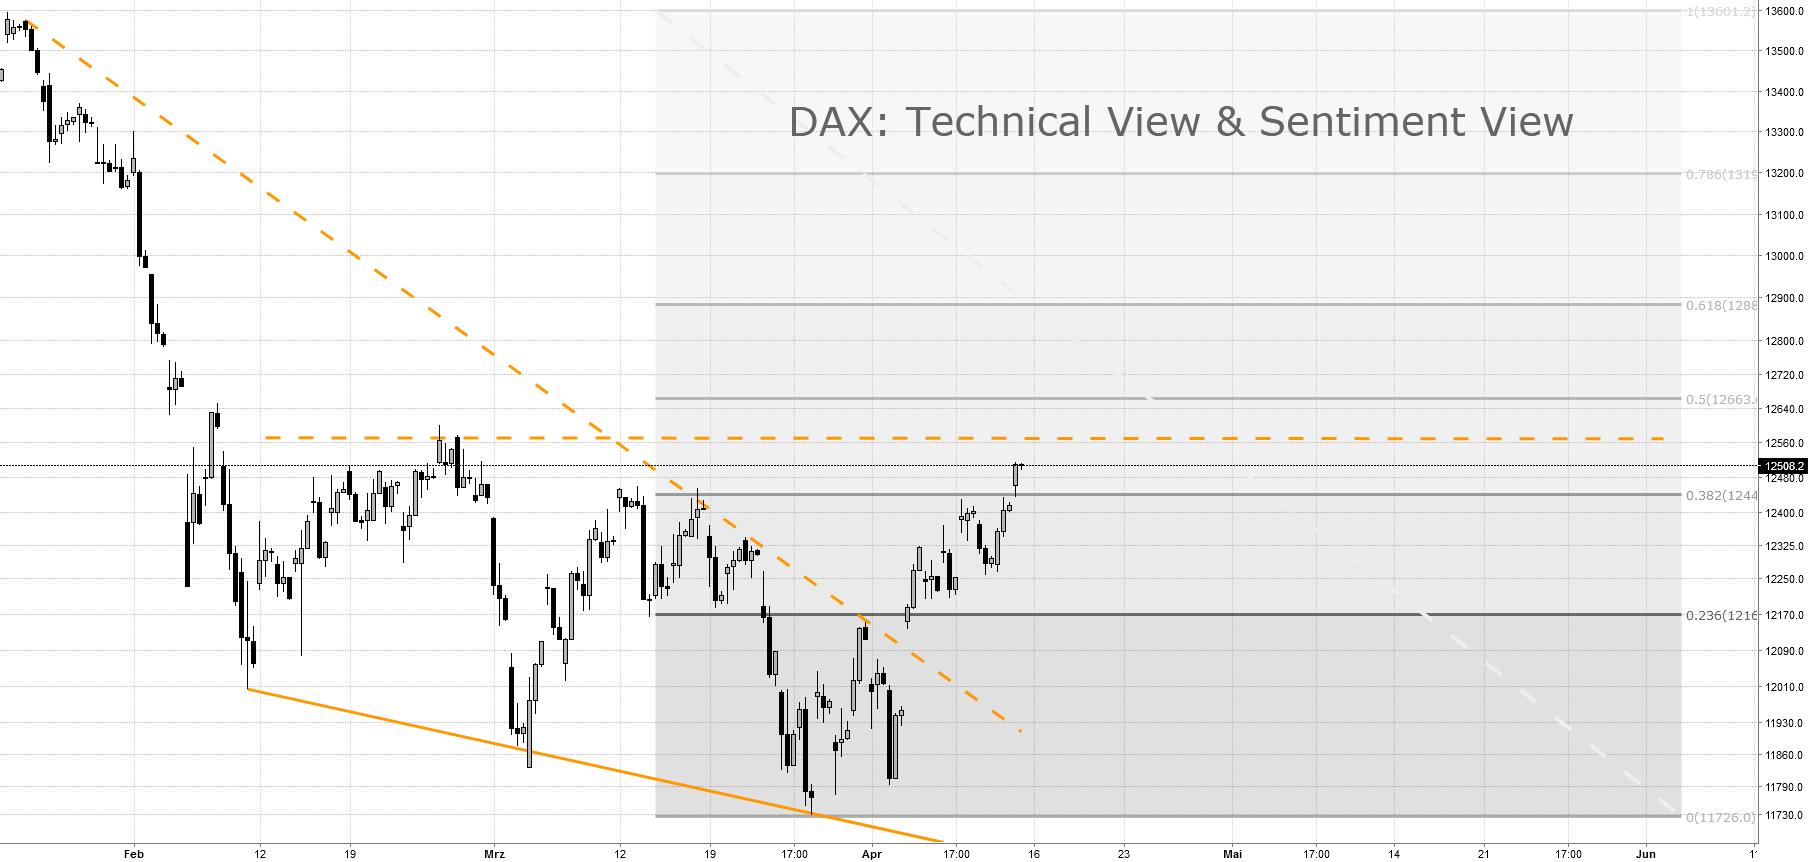 DAX: Falling Wedge Reversal Pattern